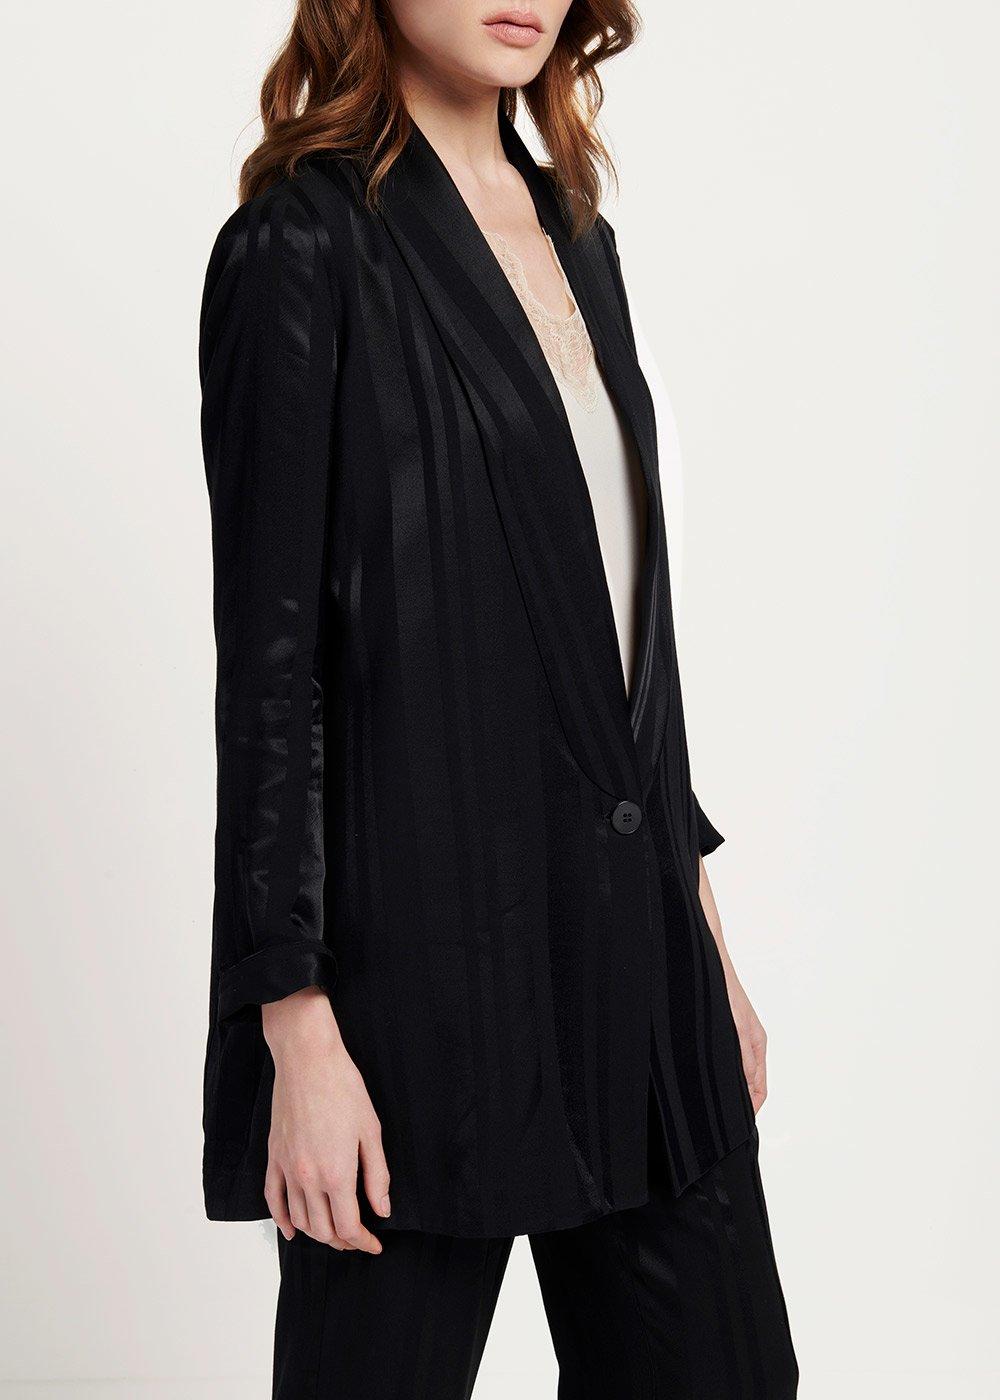 Giacca Greta modello smoking tessuto rigato - Black - Donna